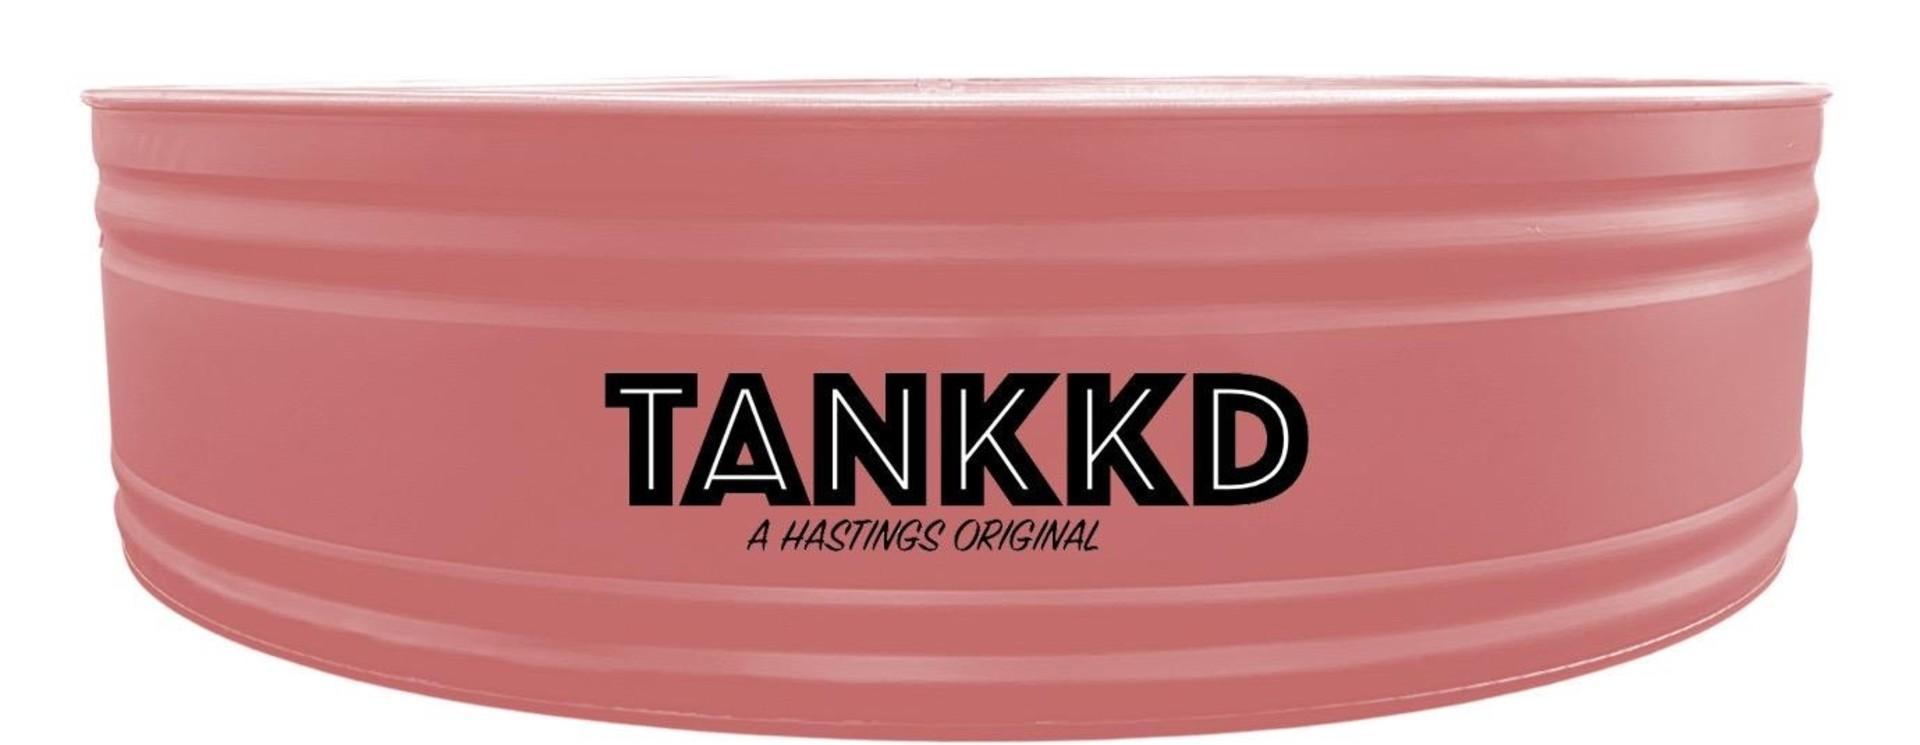 Tankkd/Hastings stock tanks  peints